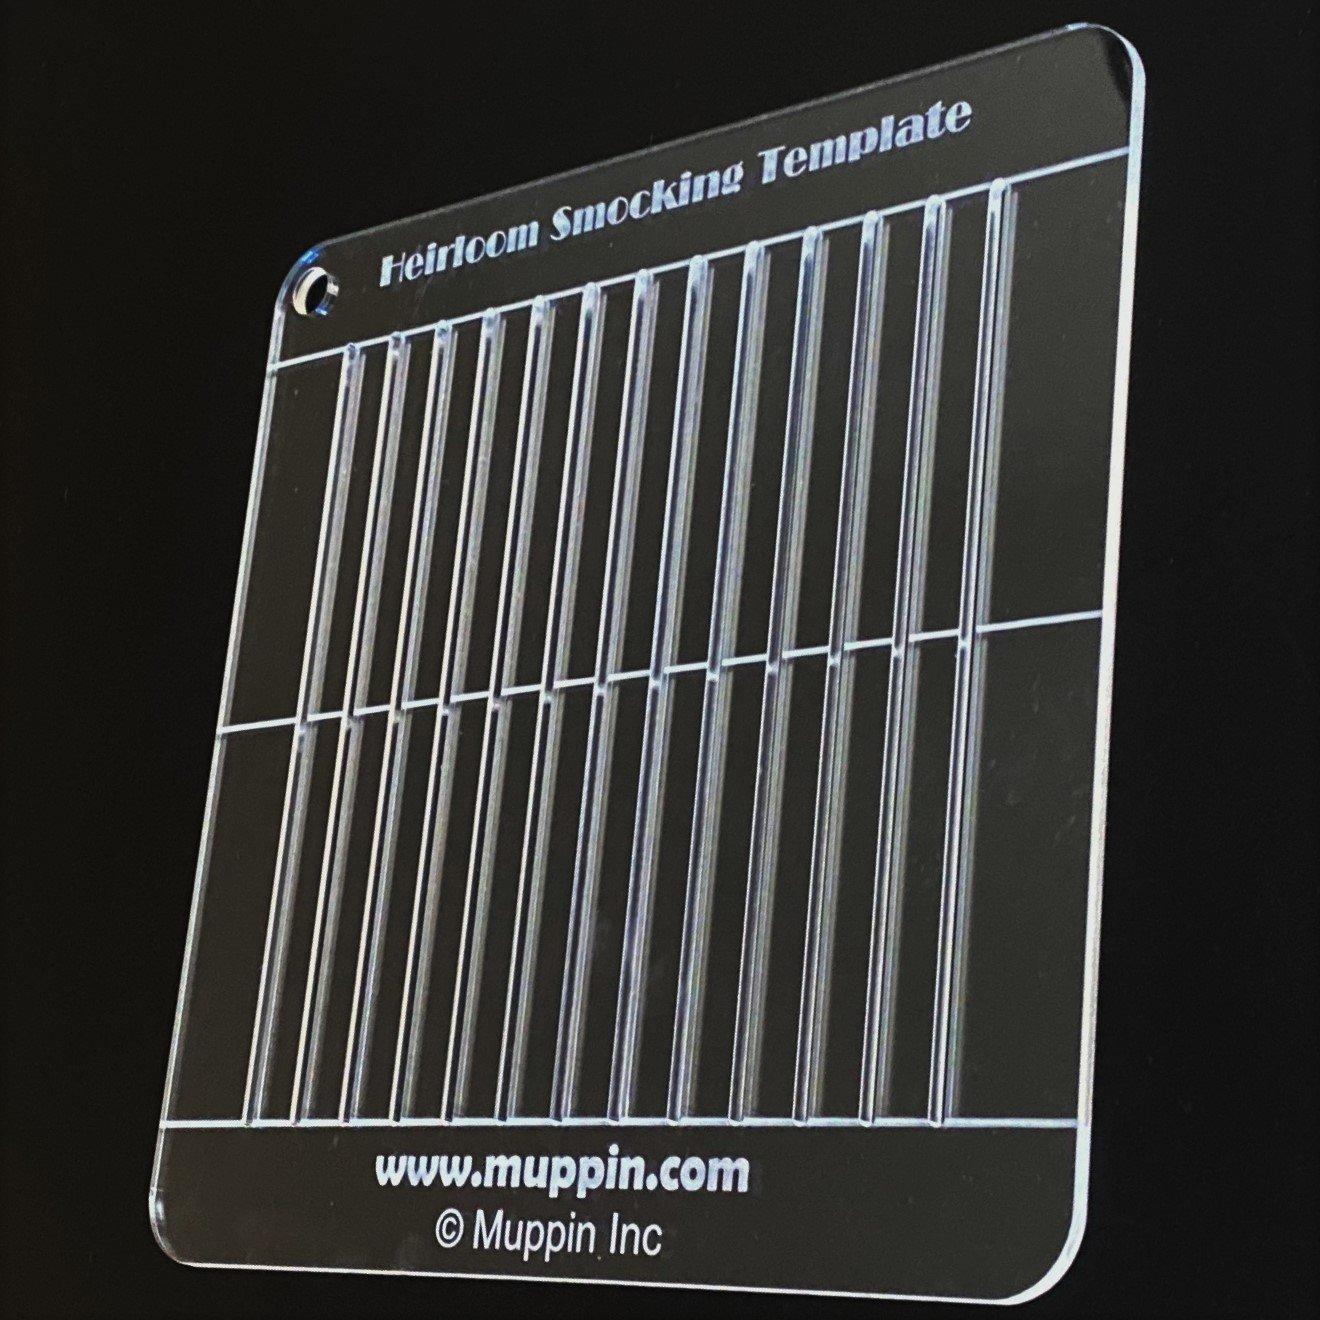 ORIGINAL Heirloom Smocking Template with Bonus Pattern